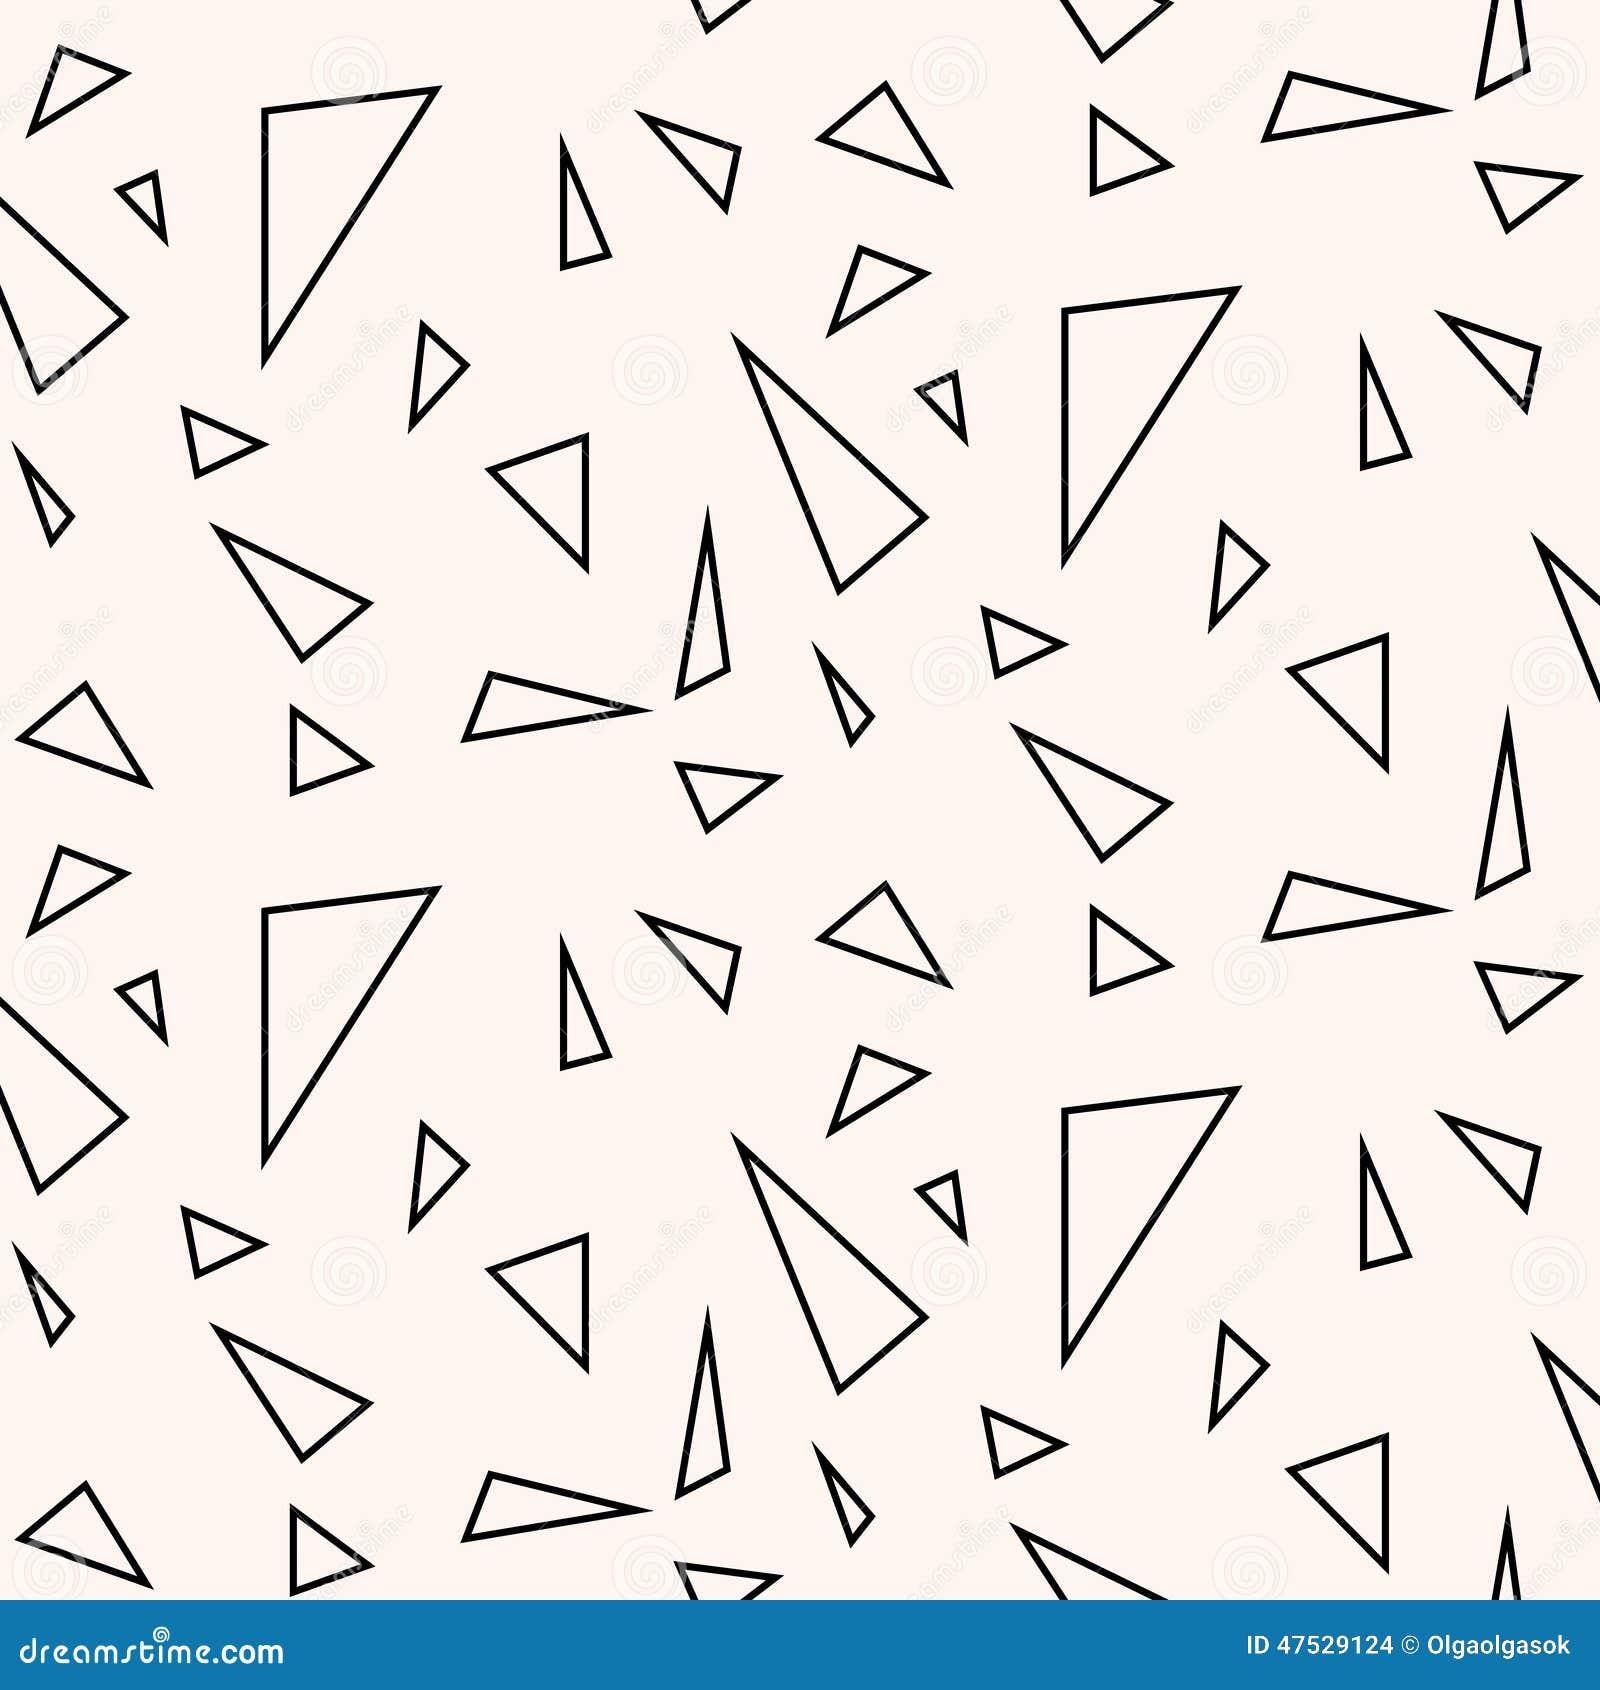 Seamless Pattern Geometric Texture Abstract Background Backdrop Mobile Smartphone Tablet Desktop Wallpaper Banner Web Design Element Scrap Booking